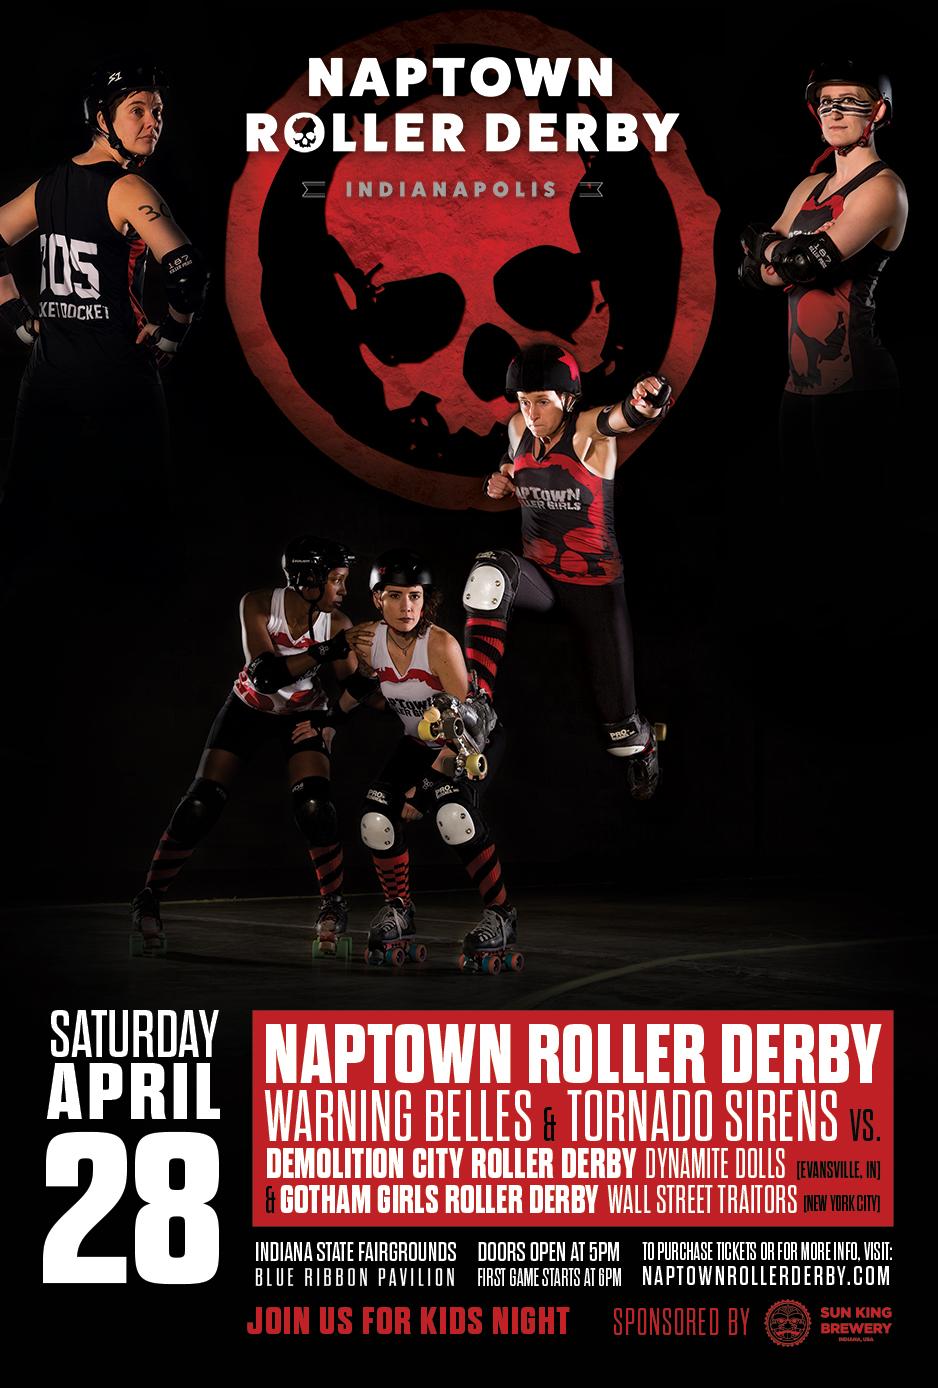 April 28, 2018 - Naptown vs. Gotham Girls Wall Street Traitors and Demolition City Dynamite Dolls